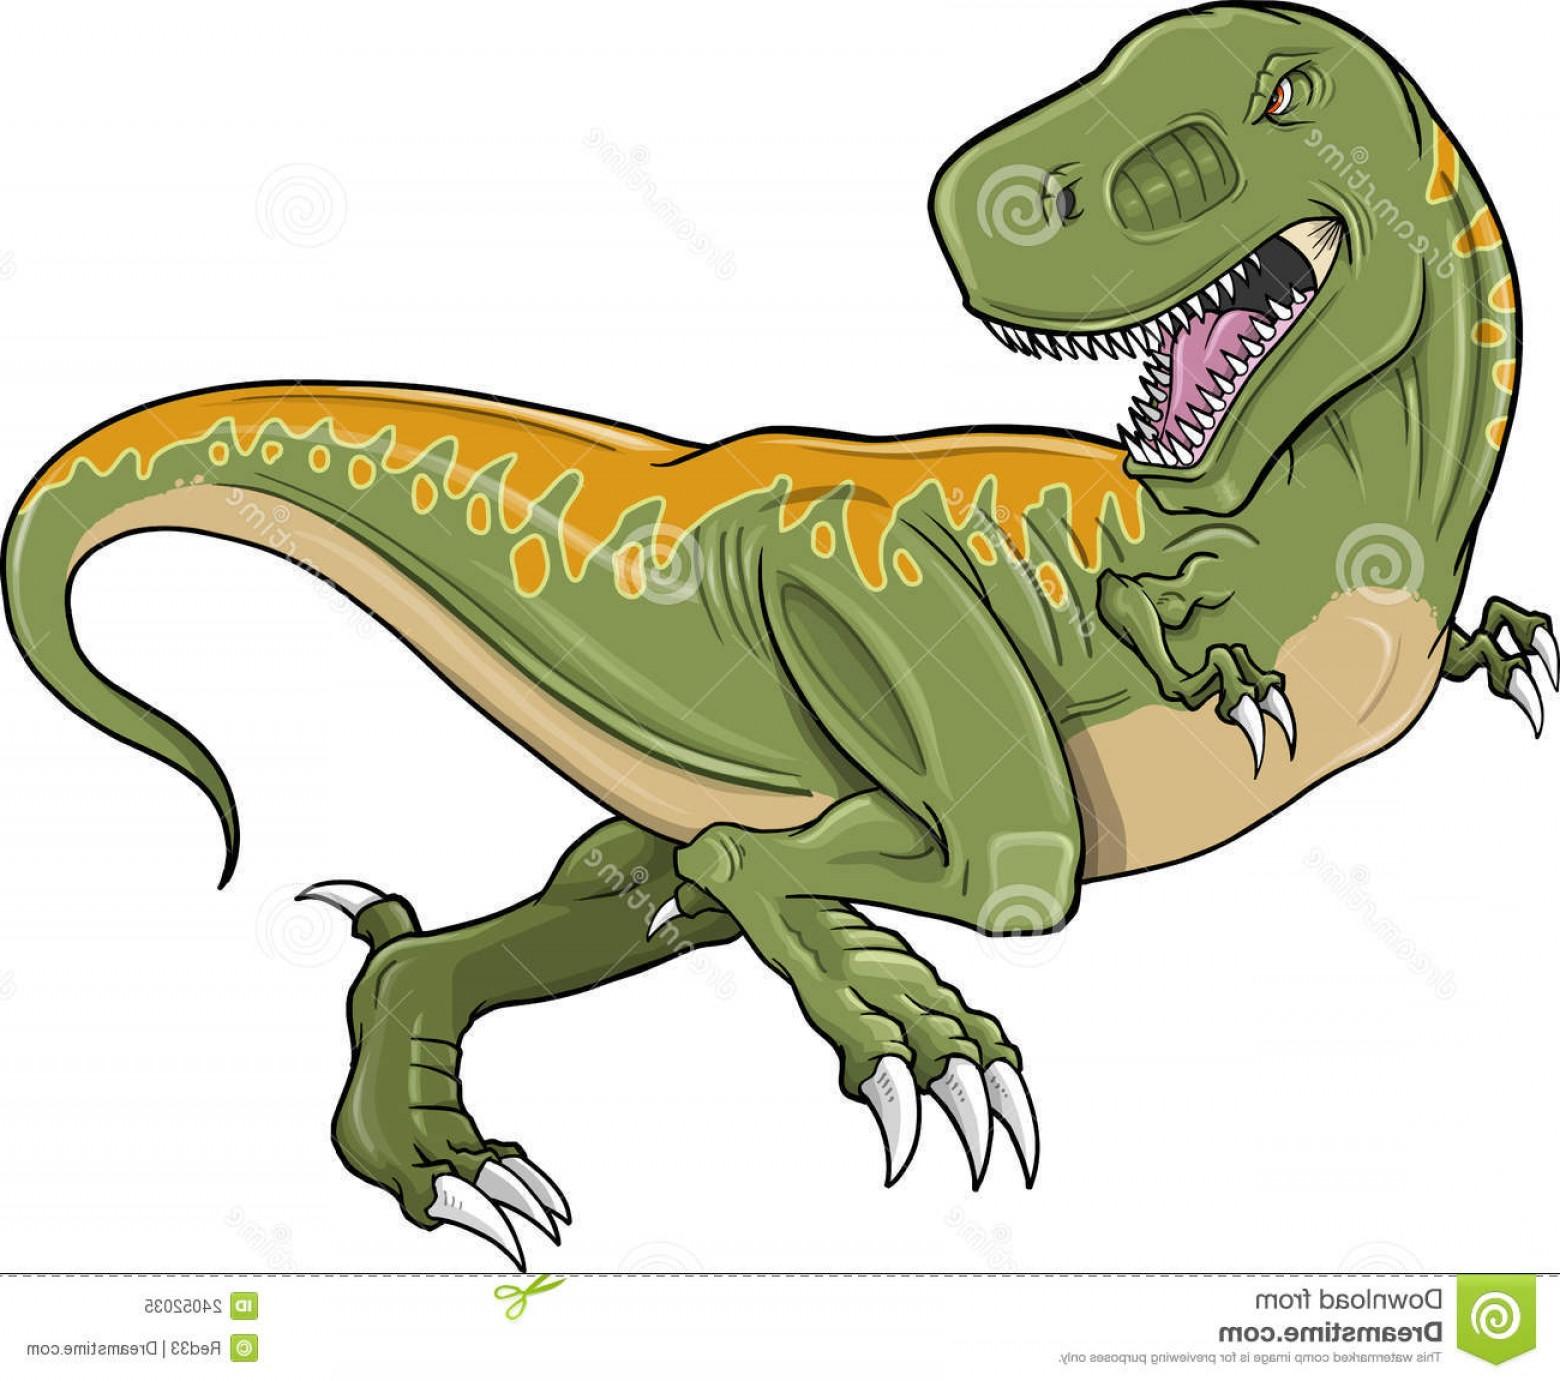 1560x1381 Royalty Free Stock Photo Tyrannosaurus Rex Dinosaur Vector Image